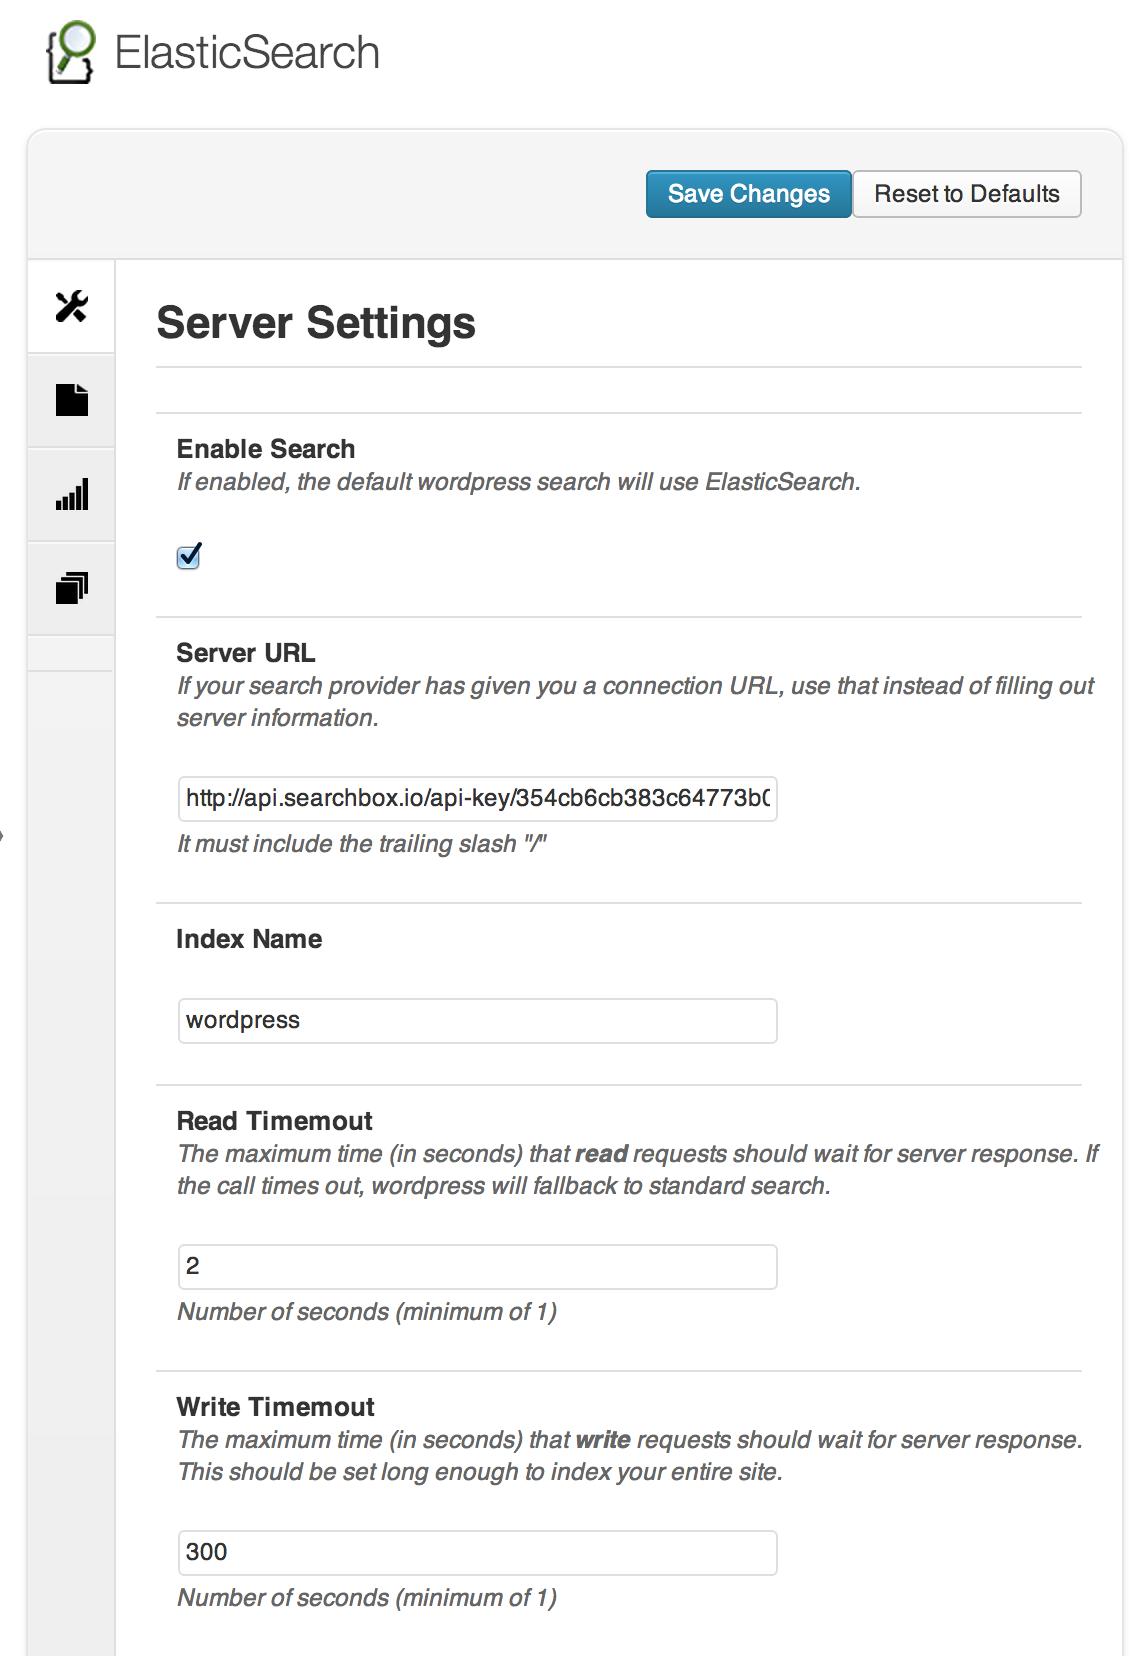 Configure your ElasticServer settings